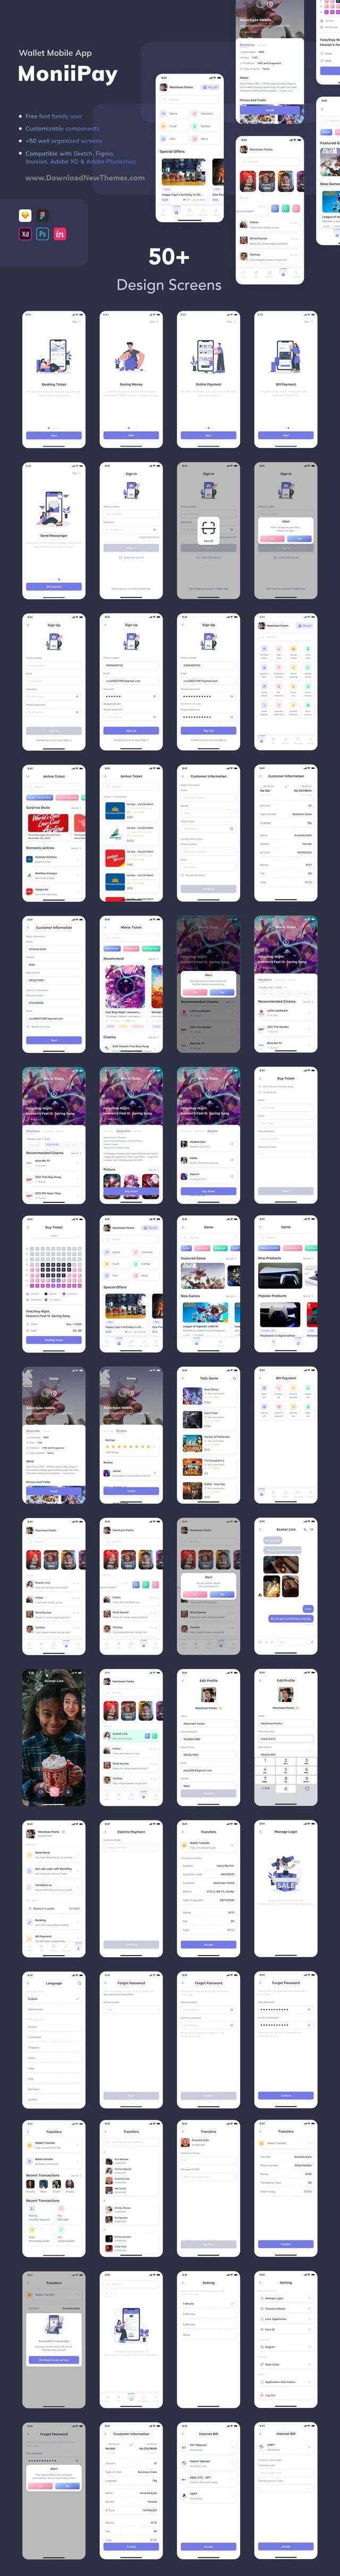 Wallet Mobile App UI Kit